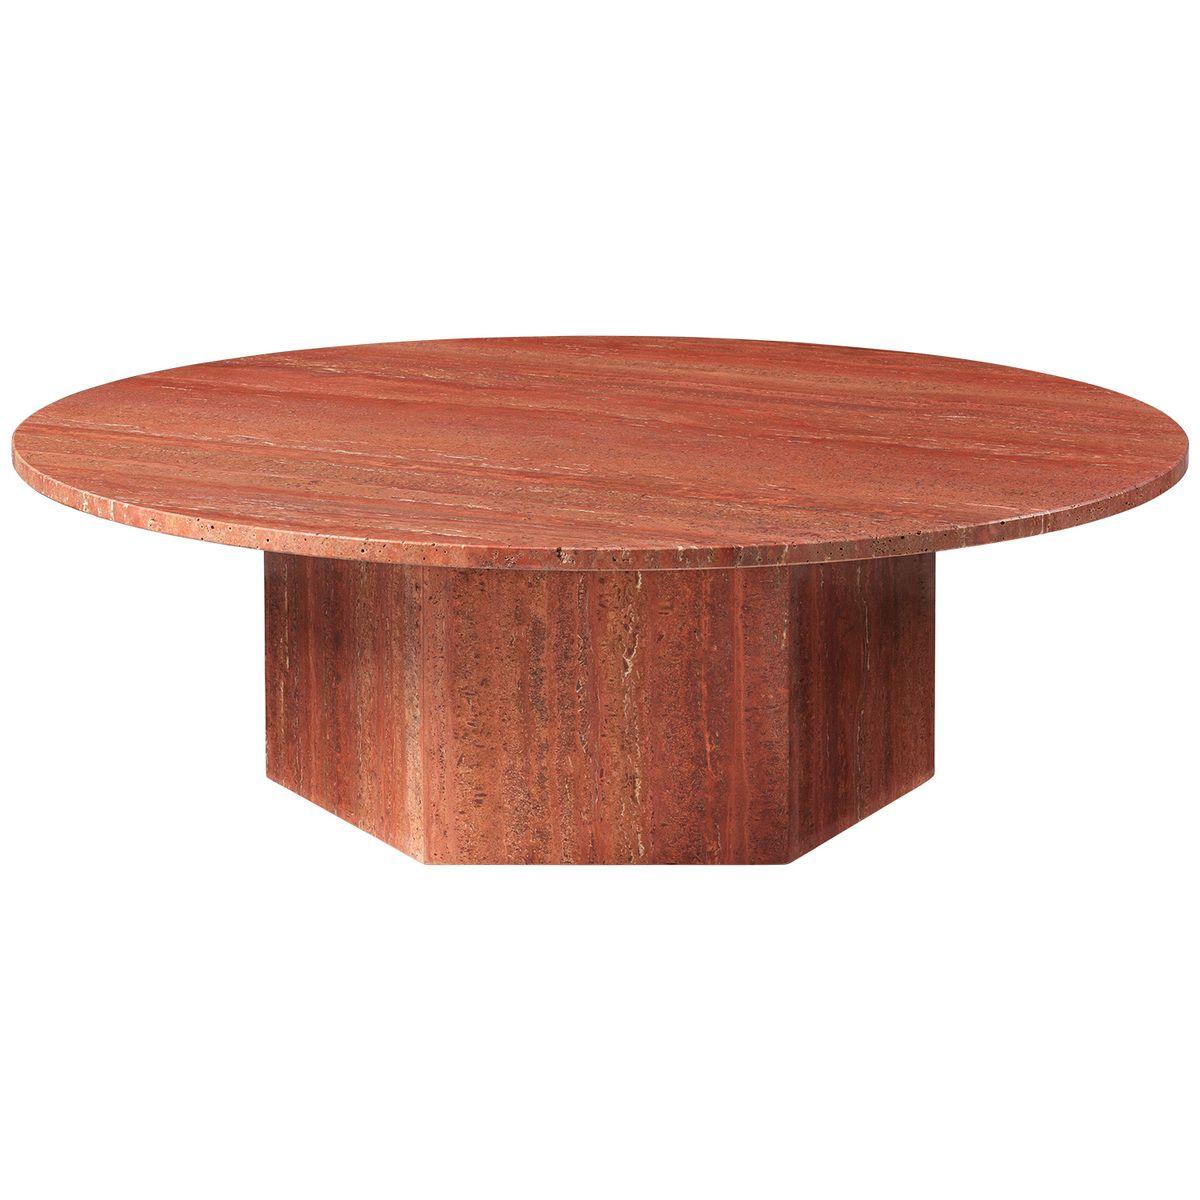 Gubi Epic Coffee Table Round 110 Cm Red Travertin Stone Coffee Table Coffee Table Gubi Beetle Dining Chair [ 1200 x 1200 Pixel ]